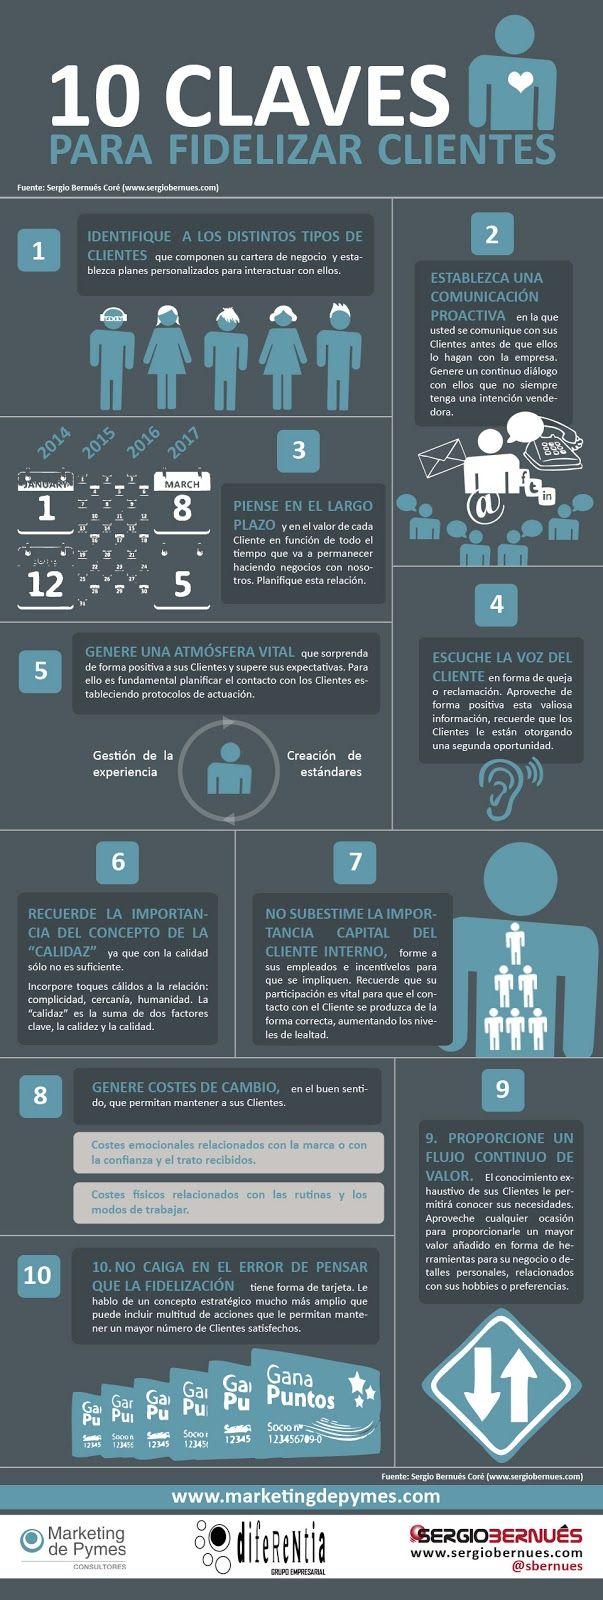 Infografía: marketingdepymes.com /vía Pinterest. Relacionado